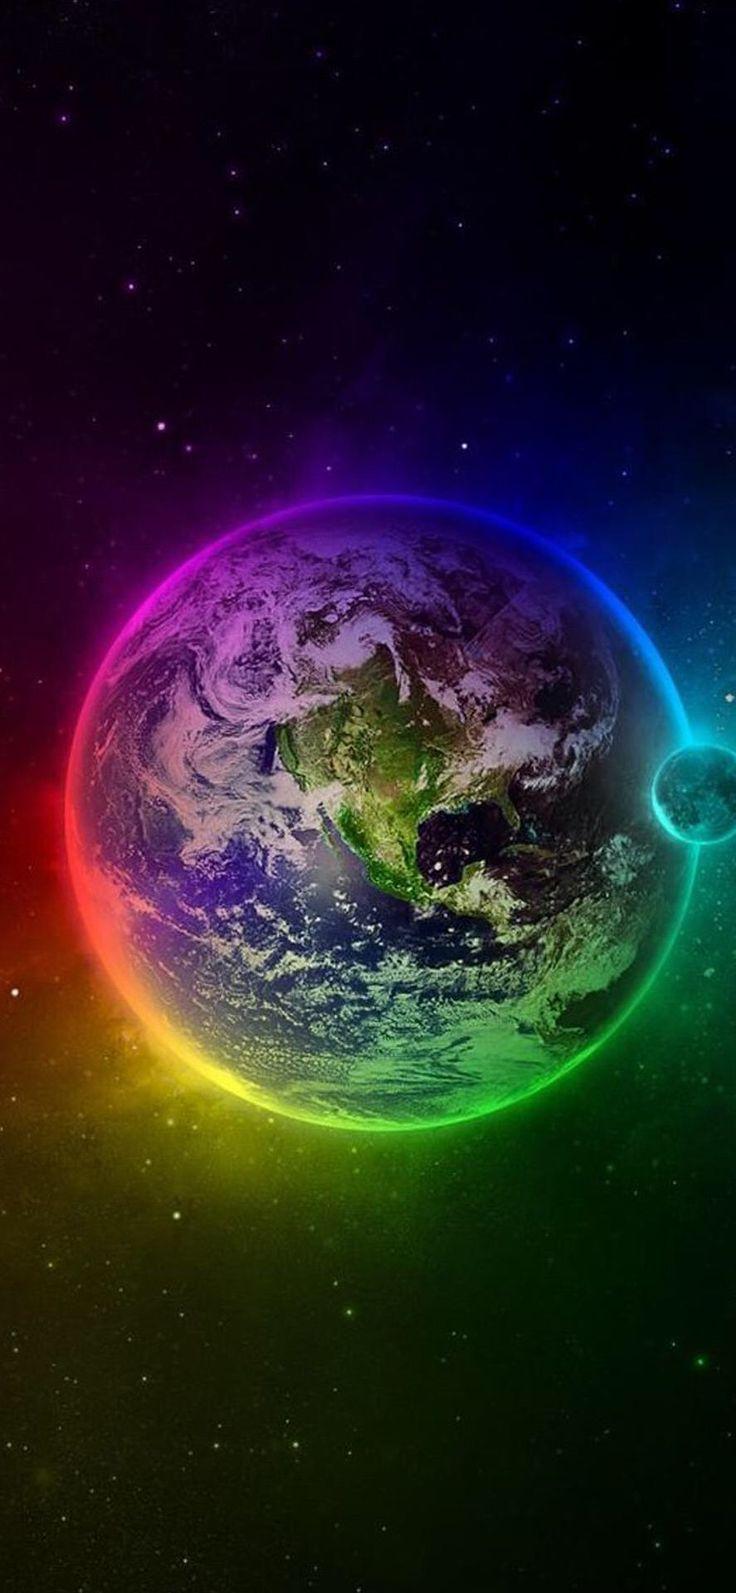 3D Earth iPhone X Wallpaper 537546905528583958 5